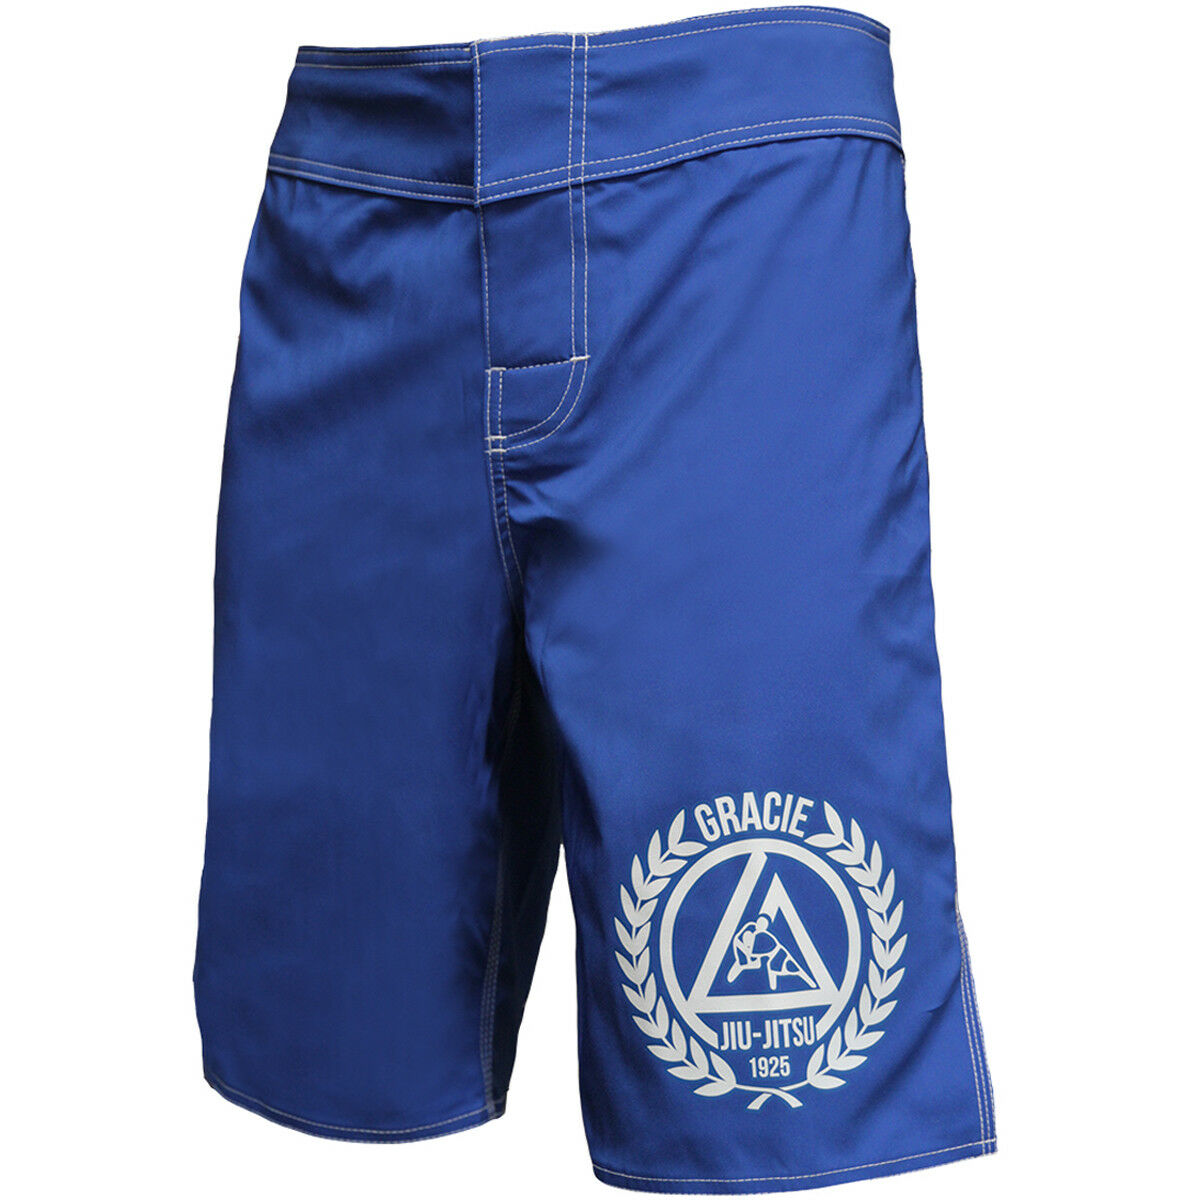 Gracie Jiu-Jitsu Royal 2.0 MMA Fight Shorts - Royal bluee